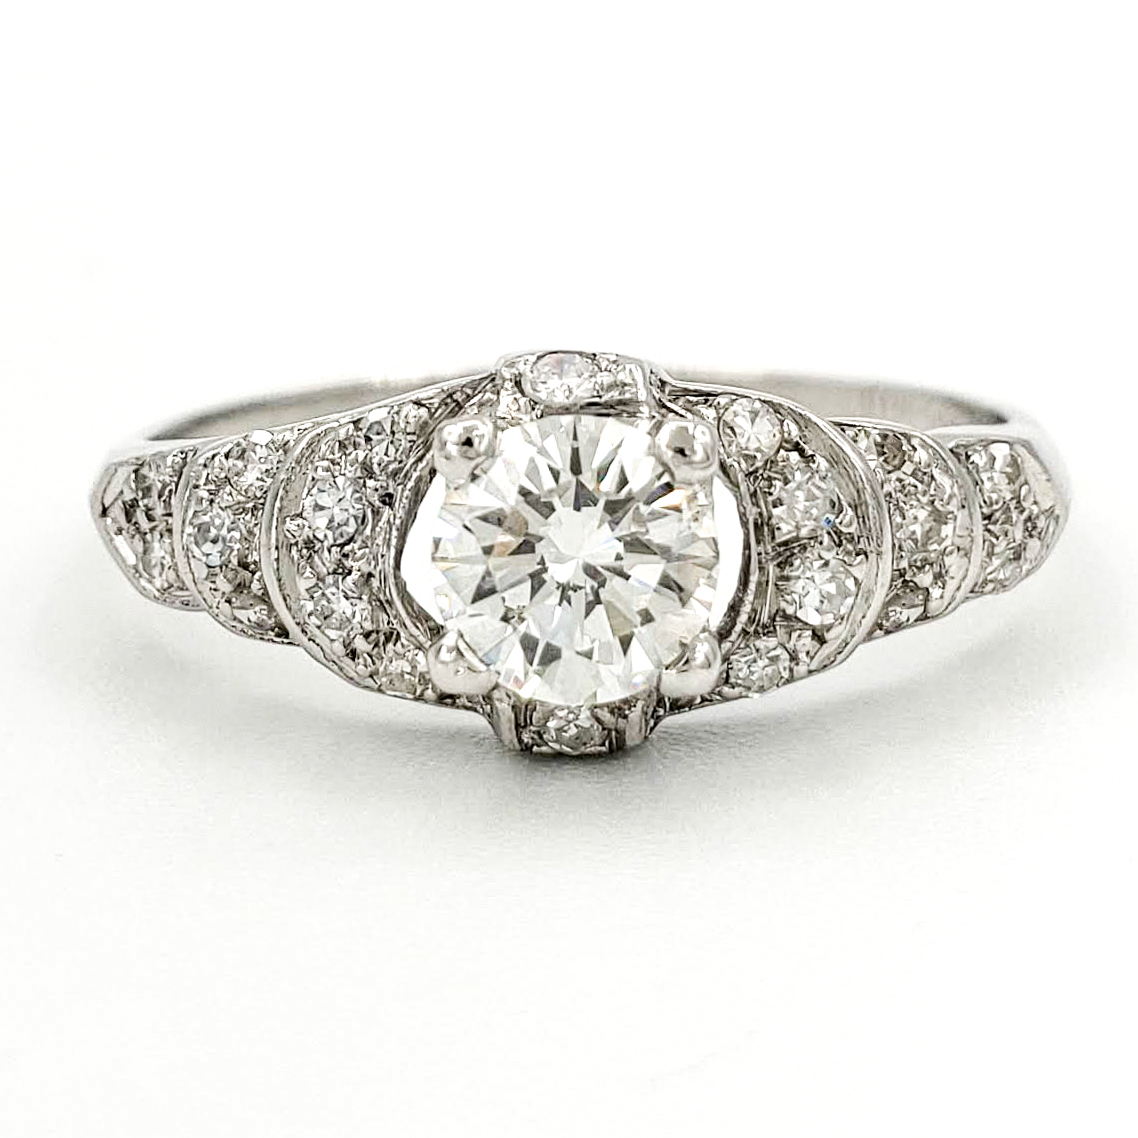 vintage-platinum-engagement-ring-with-0-43-carat-round-brilliant-cut-diamond-gia-h-si1